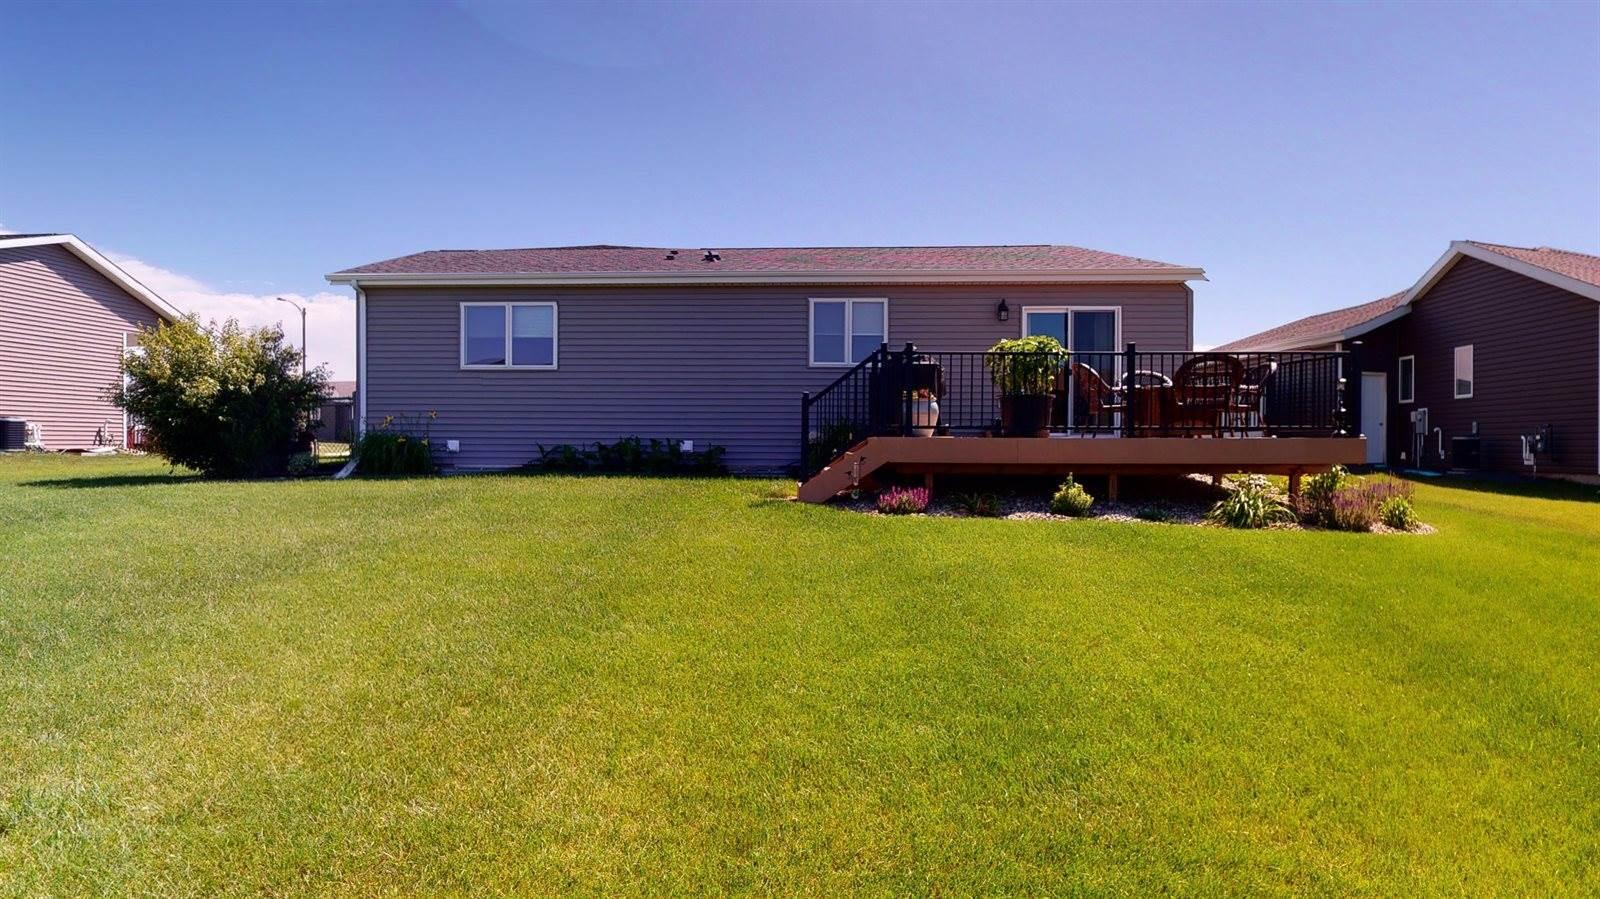 3400 Doubleday Drive, Bismarck, ND 58503